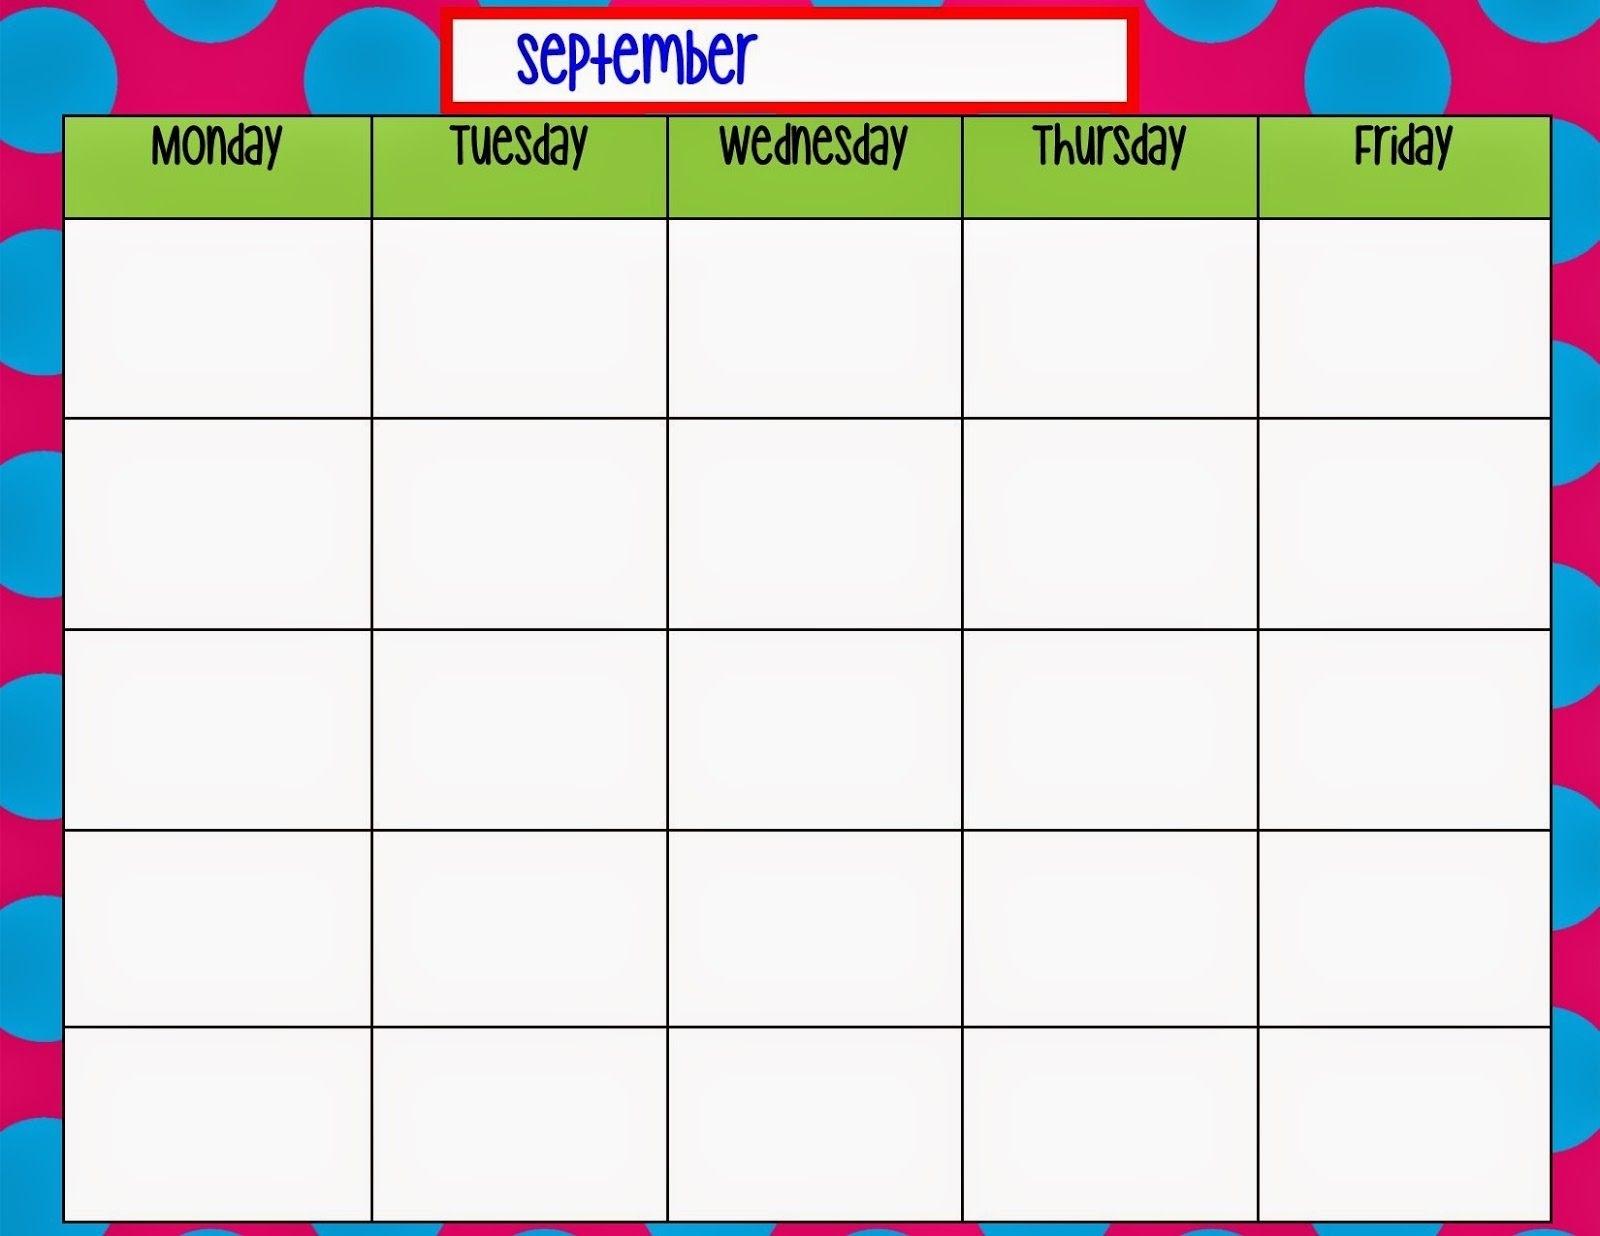 Monday Through Friday Calendar Template | Preschool | Pinterest  Printable Weekly Schedule Monday Through Friday